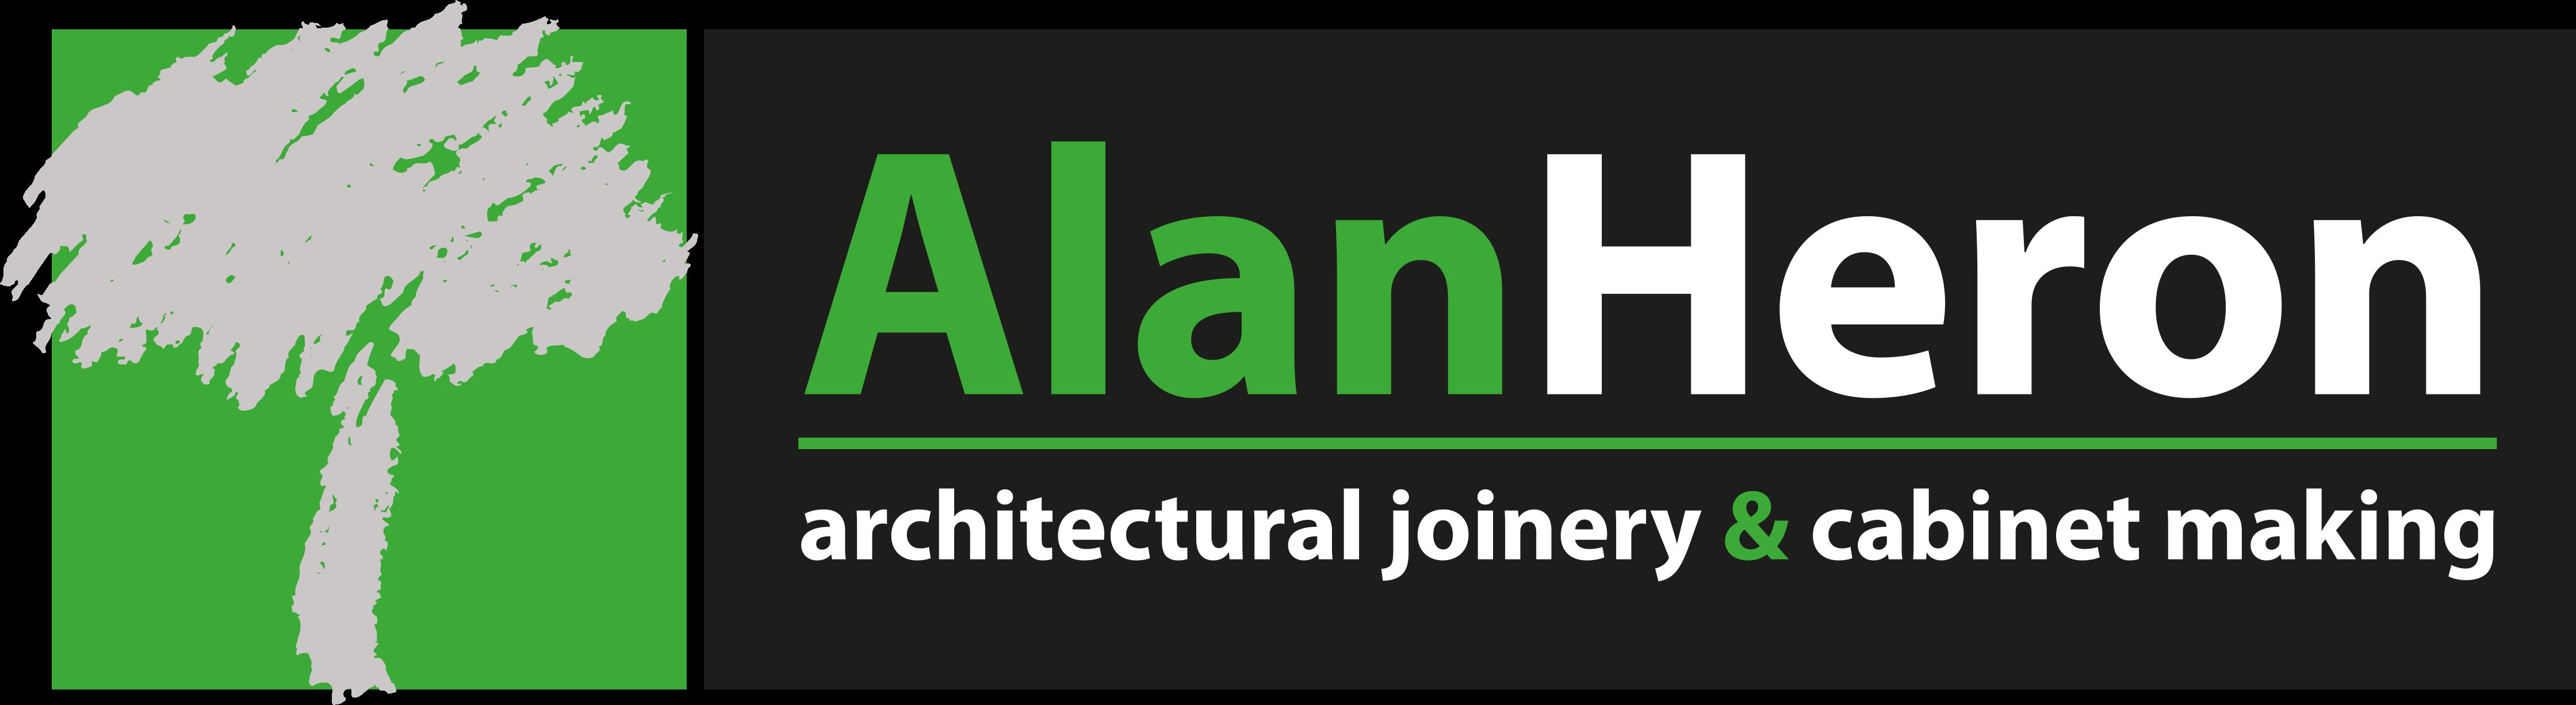 Alan Heron